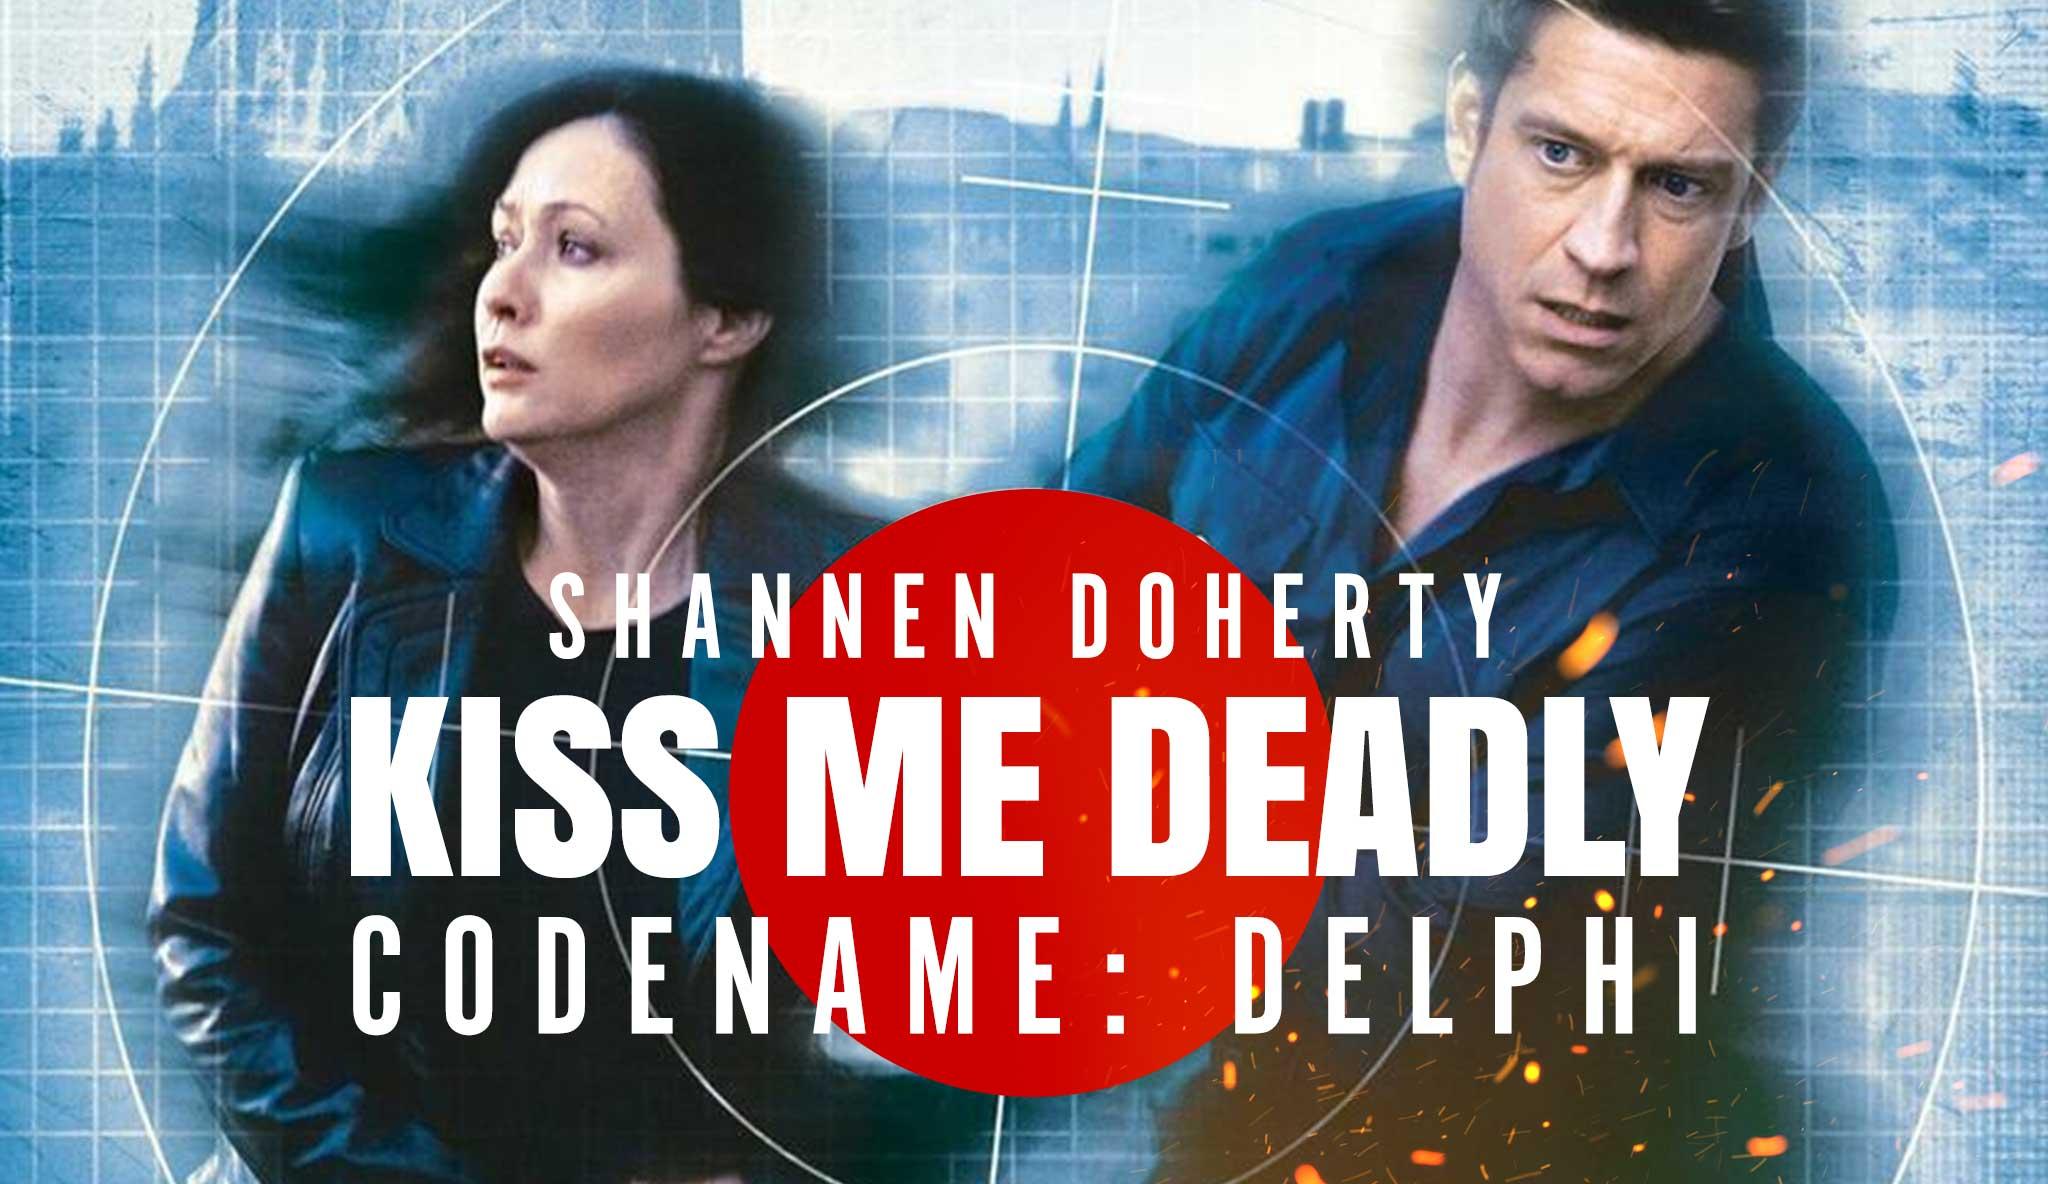 kiss-me-deadly-codename-delphi\header.jpg